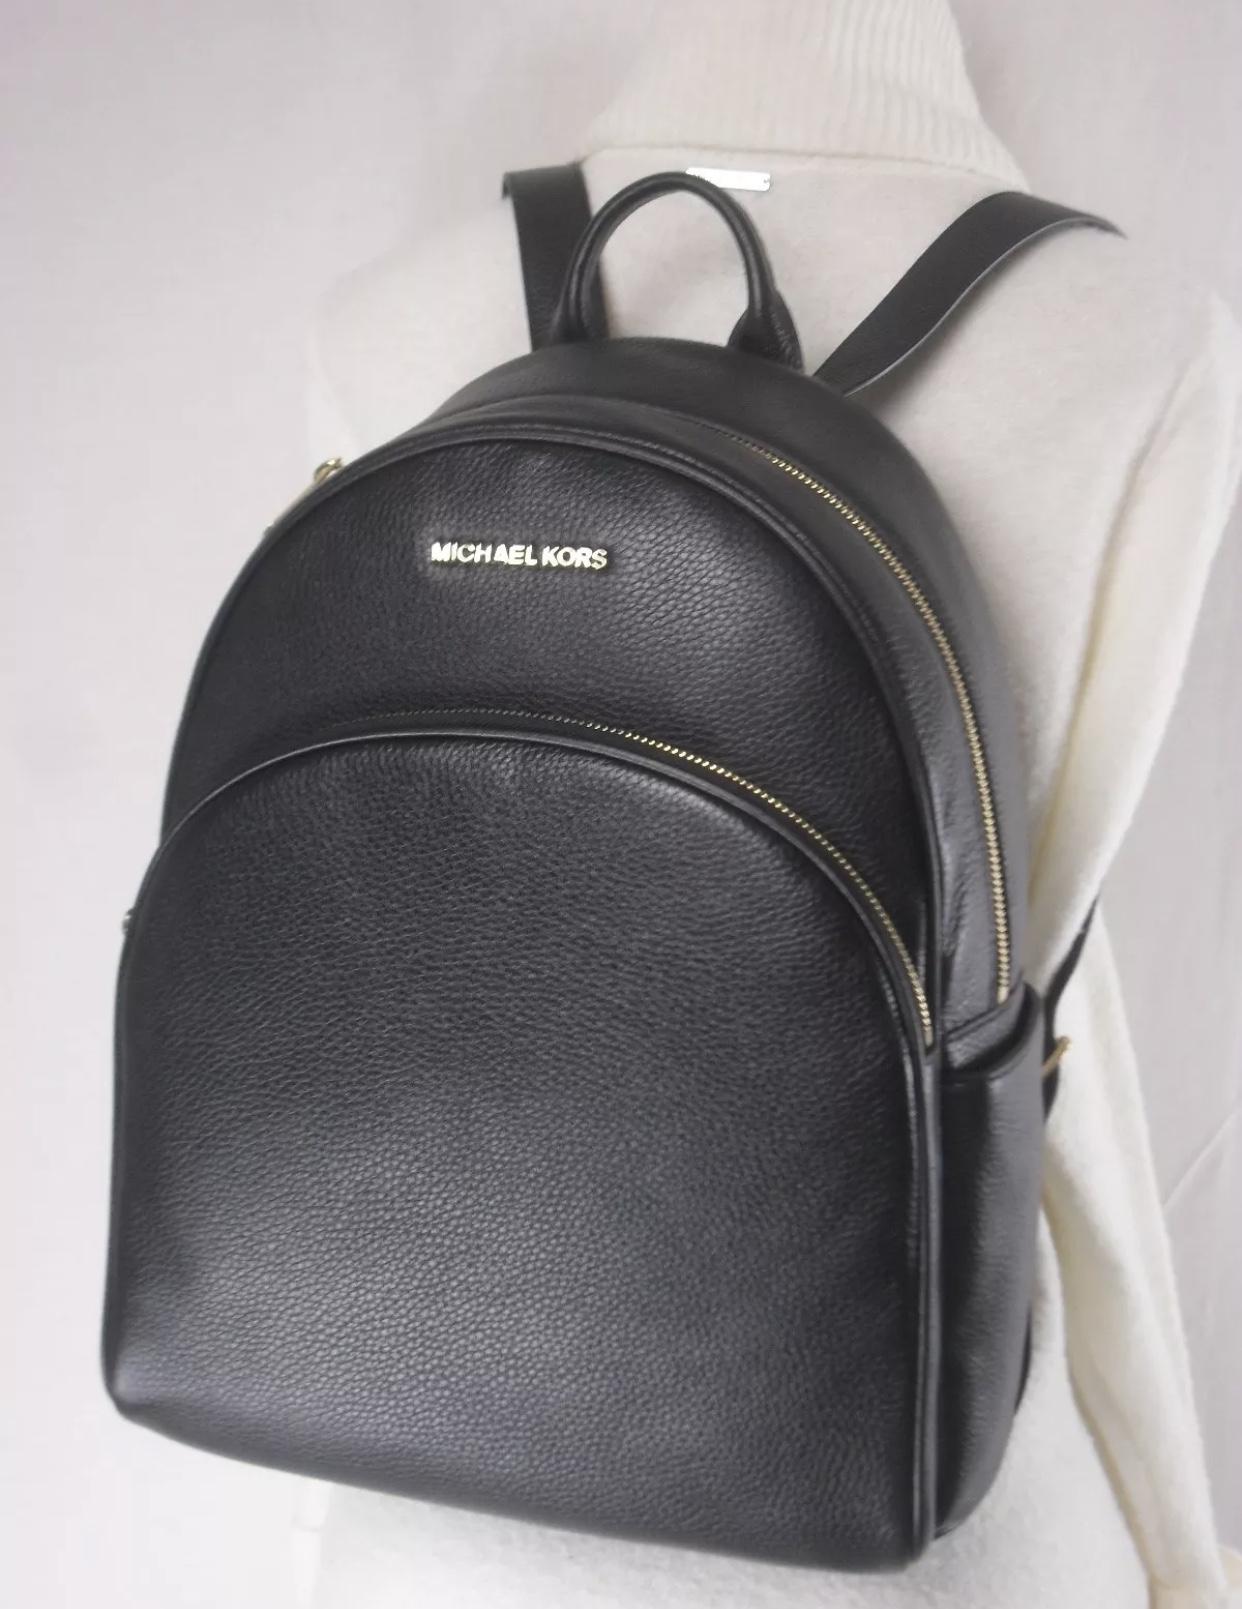 7adcf8e2e3686 Oryginalny plecak Michael Kors Abbey duży nowy - 7278934974 ...